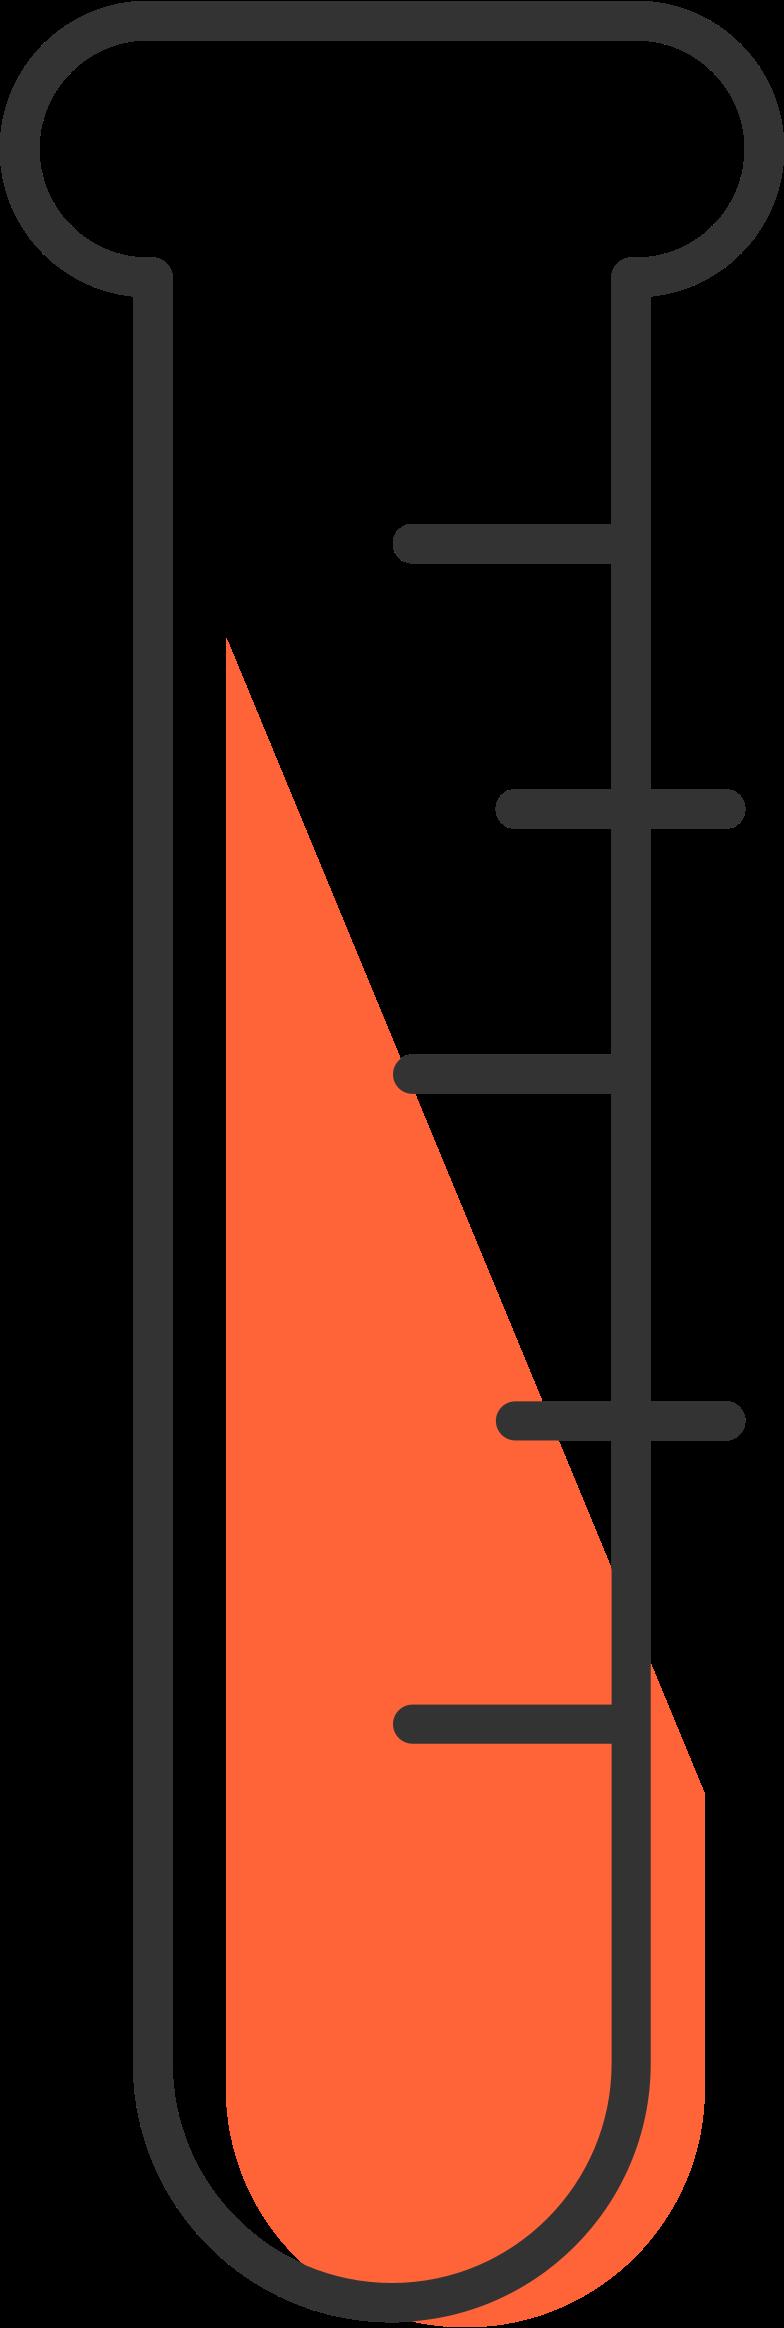 Tubo de ensaio com sangue Clipart illustration in PNG, SVG